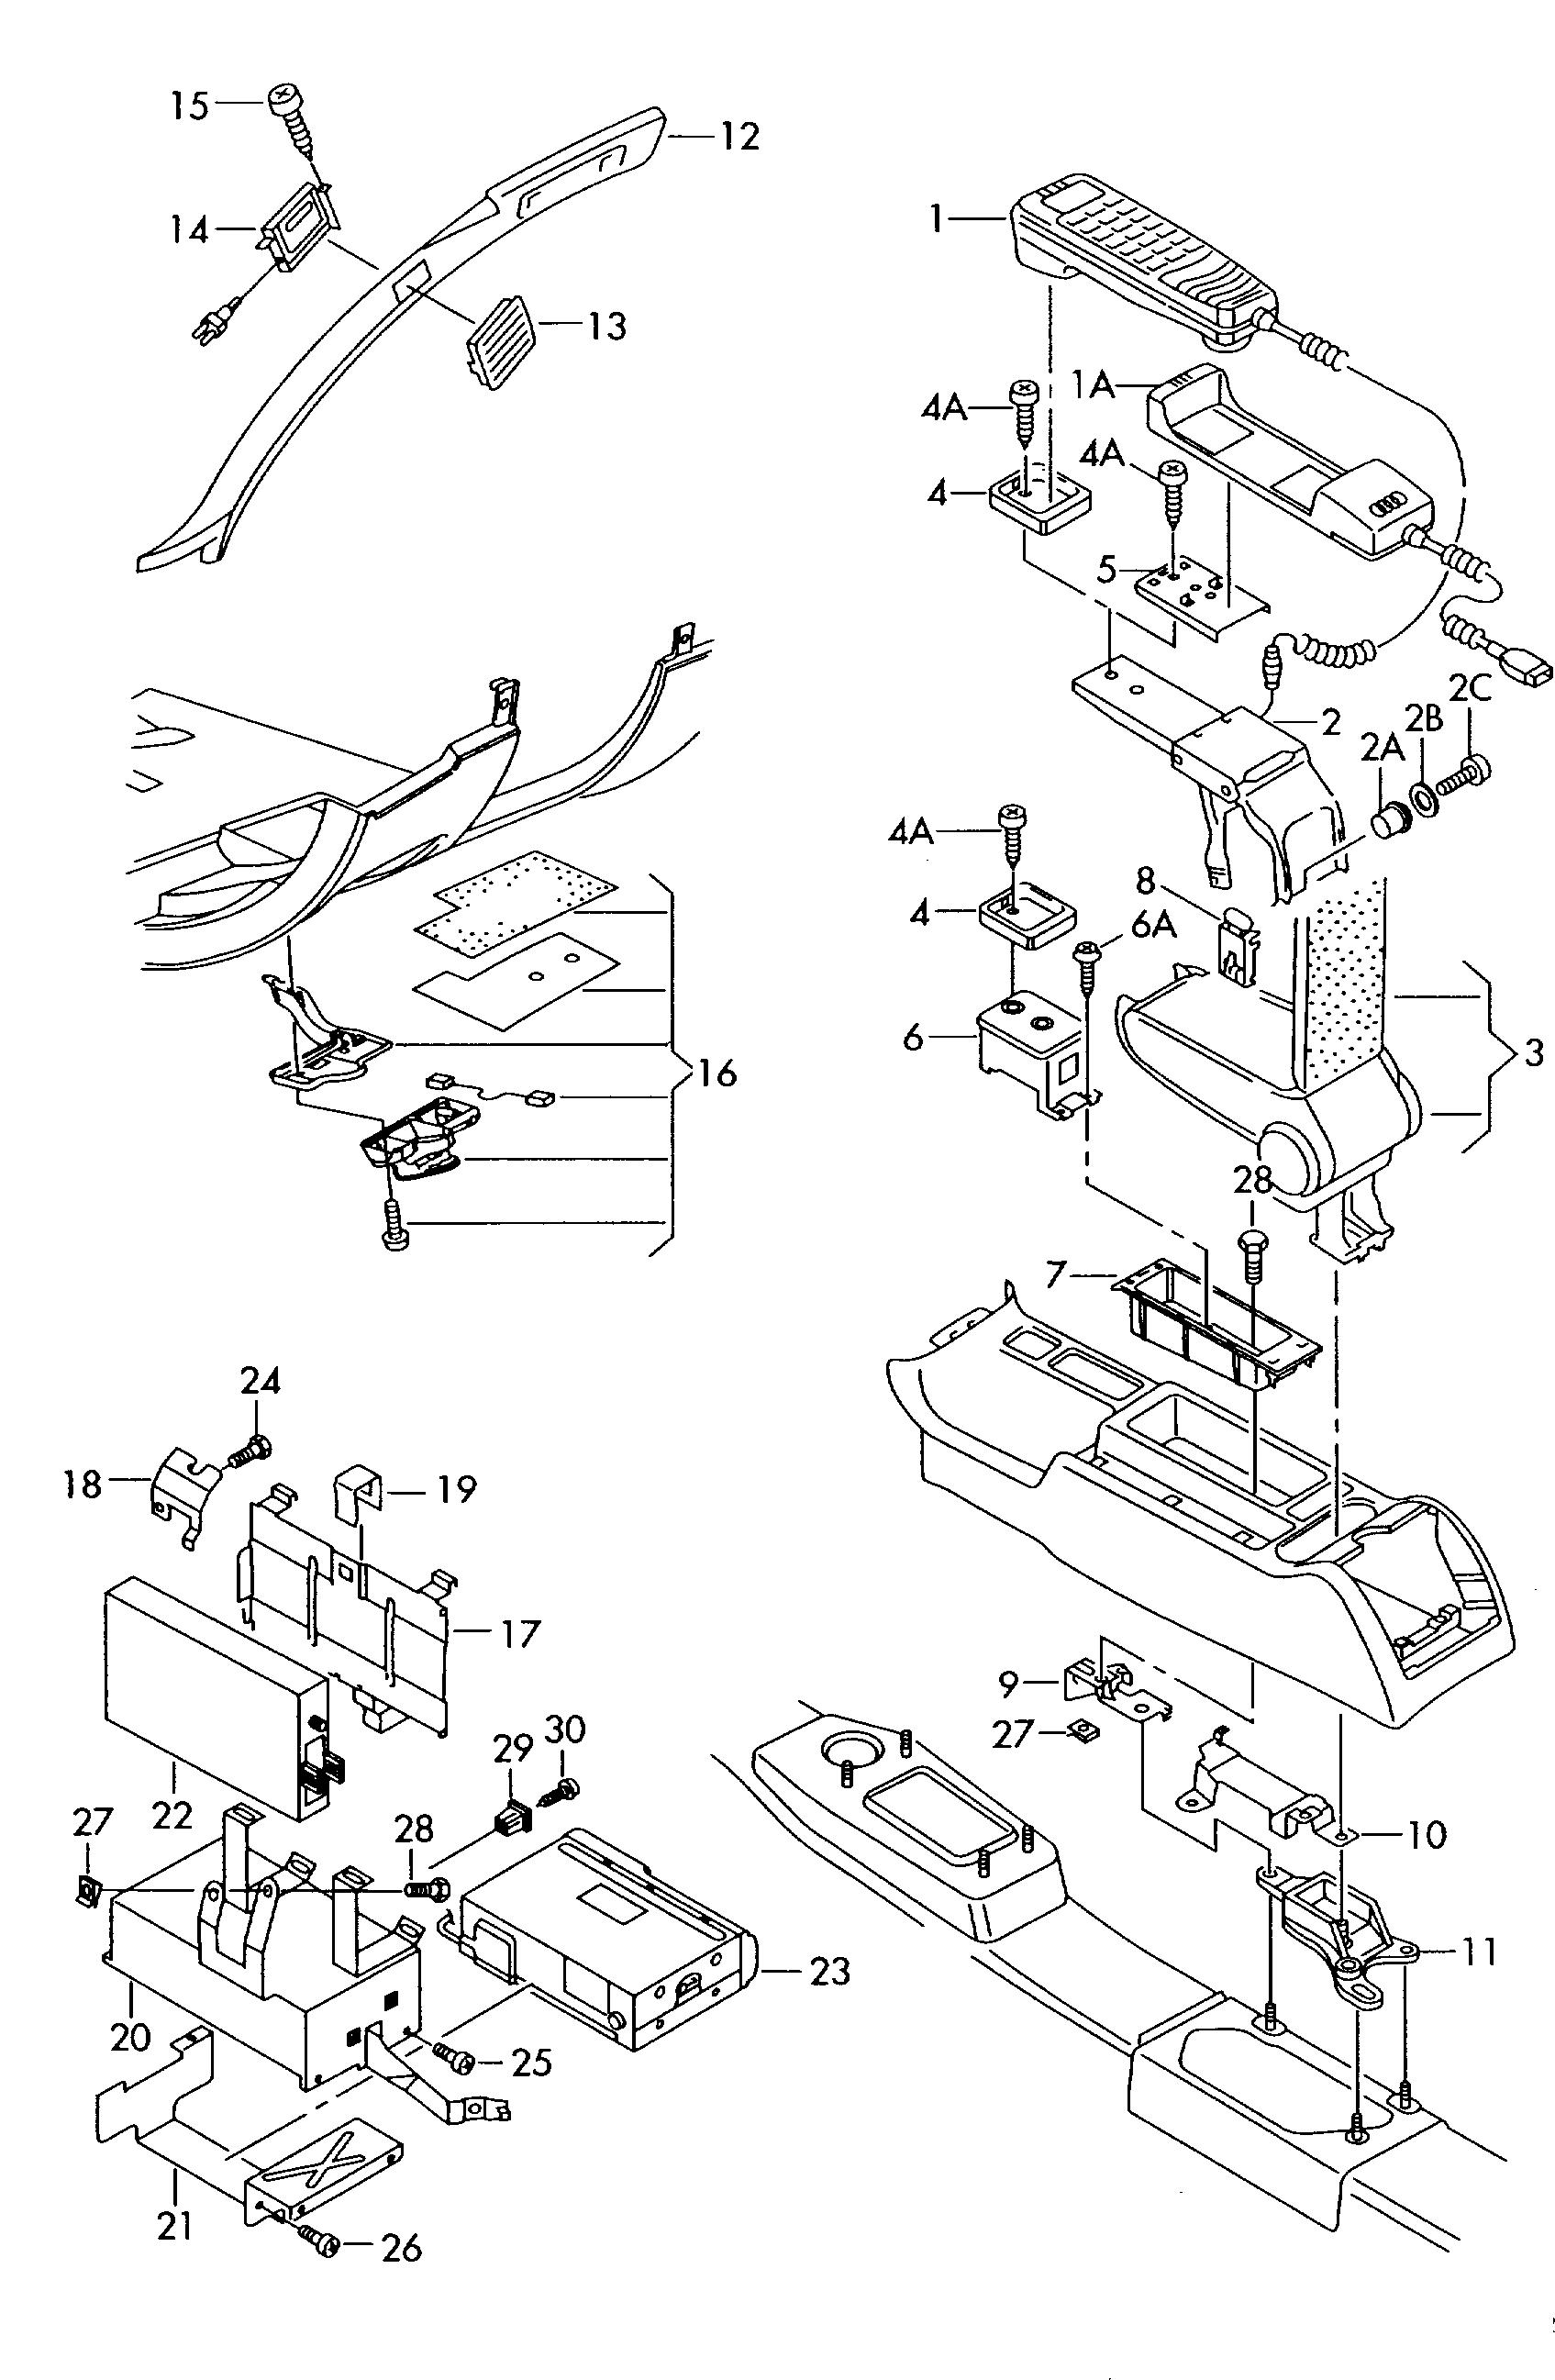 audi a6 avant 1998 2001 telephone bracket with parts kit for Ariens Snowblower Parts audi a6 avant 1998 2001 vag etka